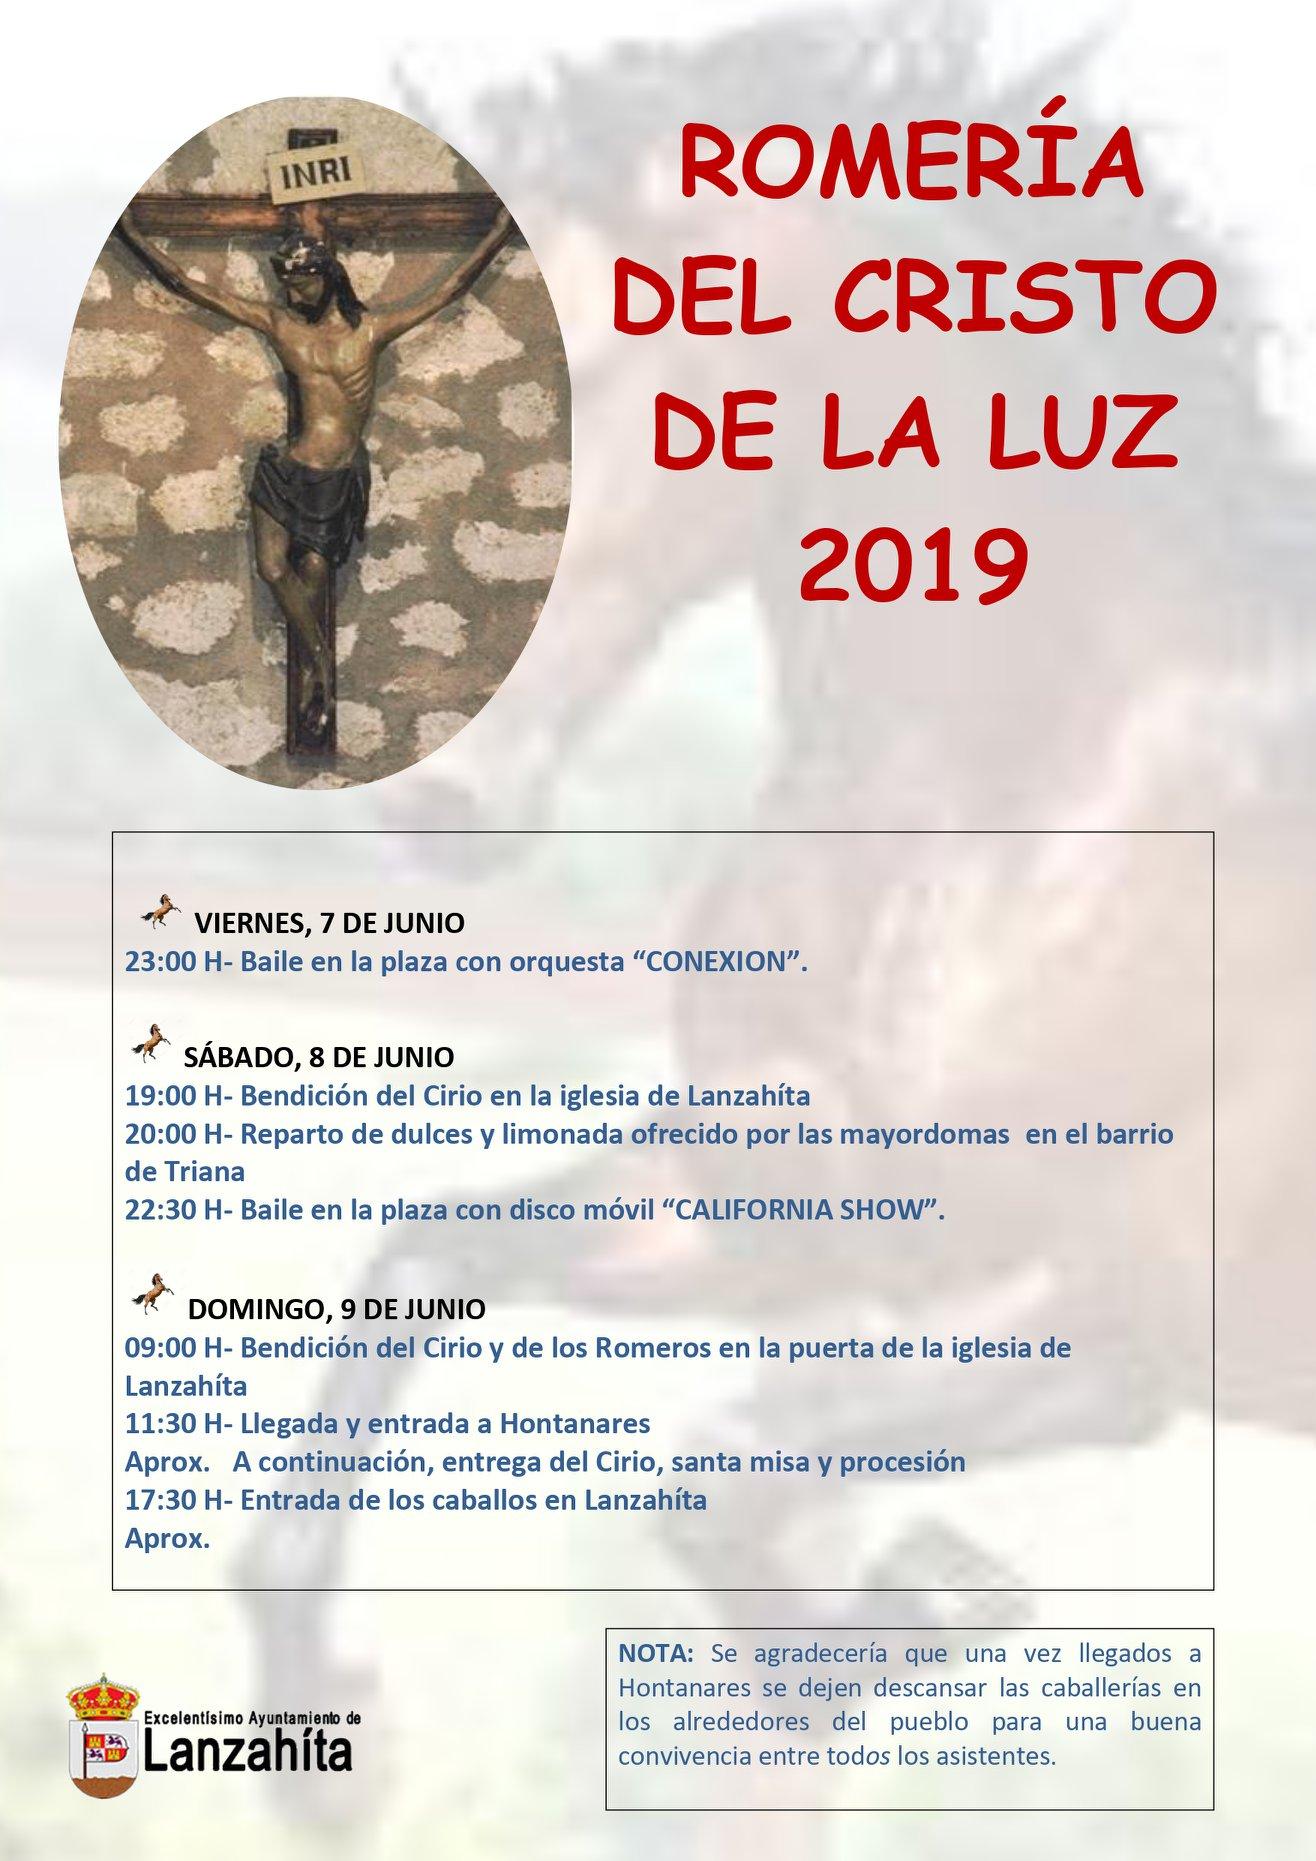 Romería del Cristo de La Luz - Lanzahíta - TiétarTeVe